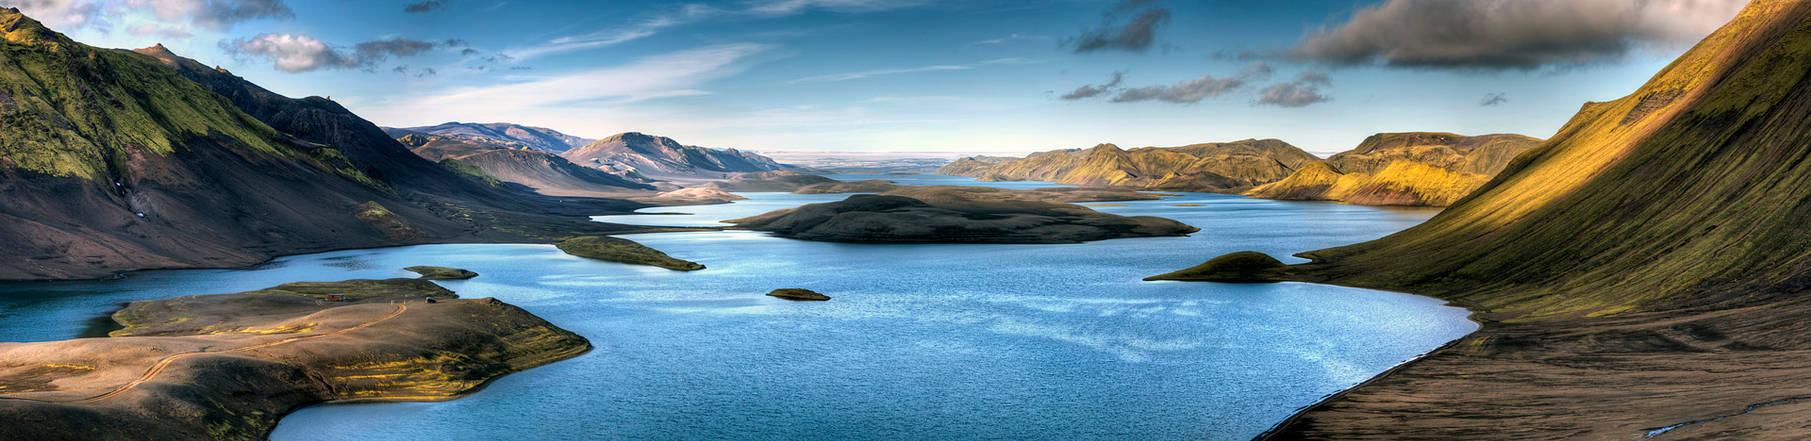 Iceland 74